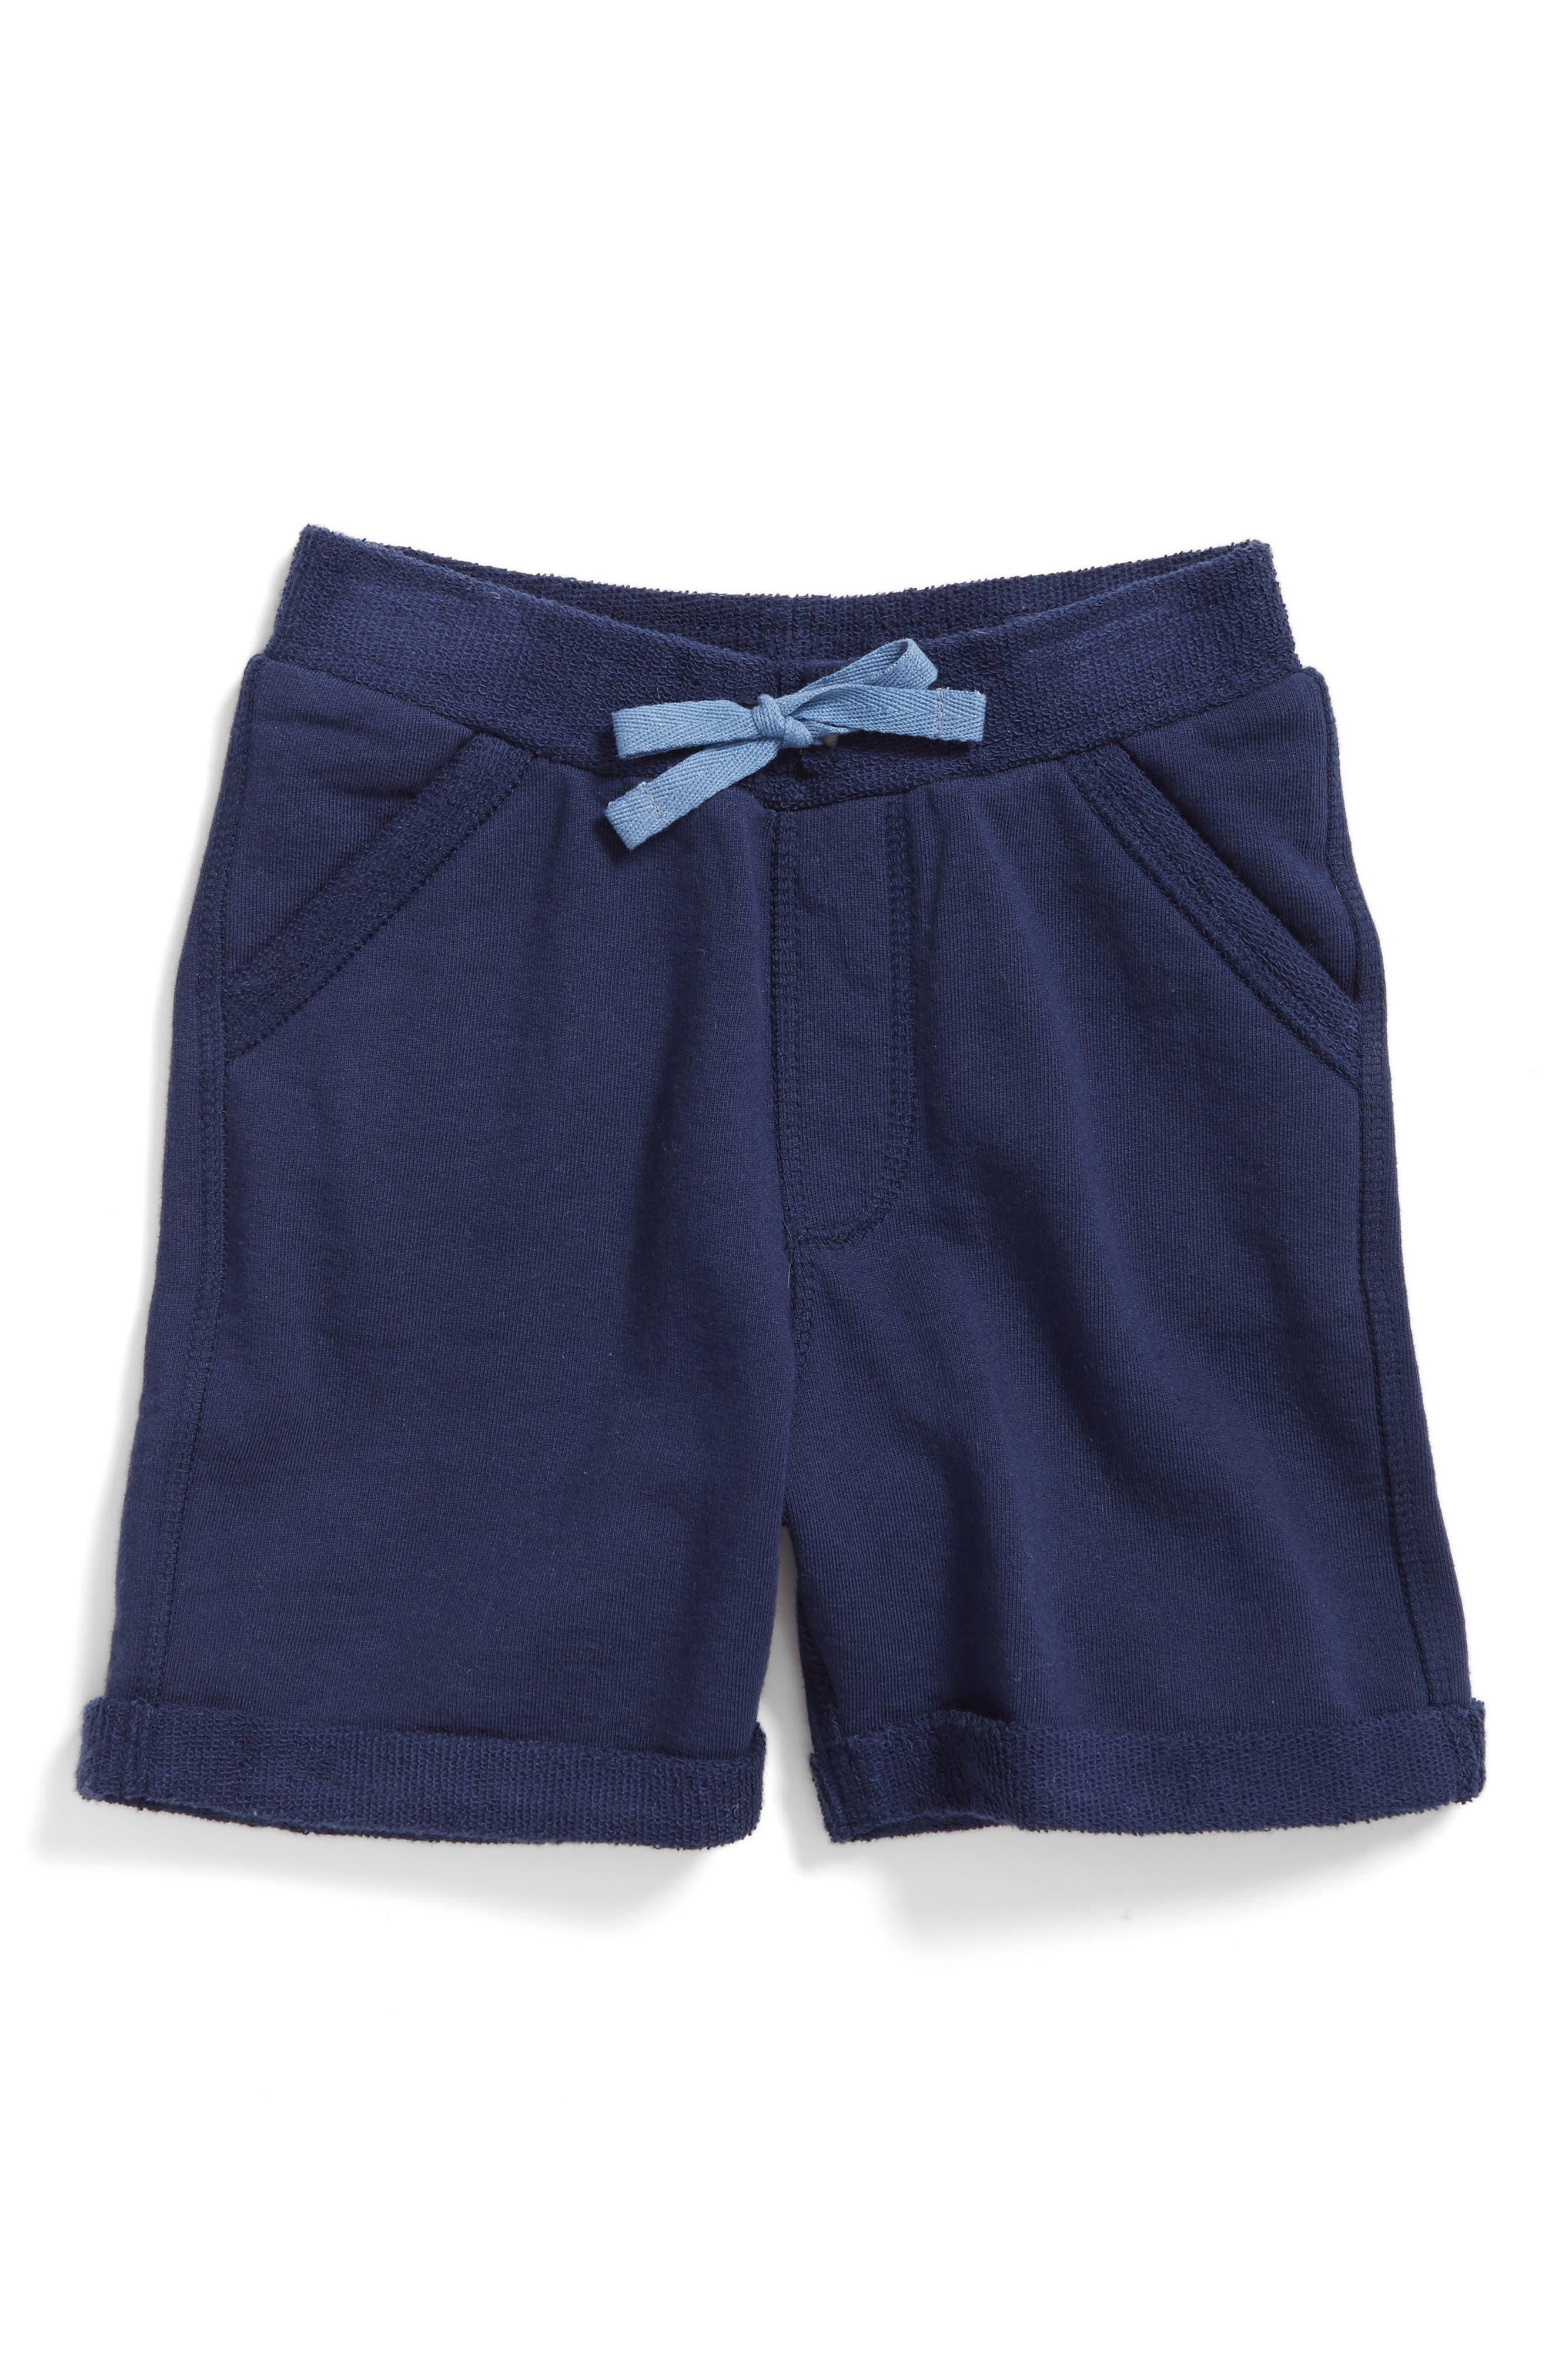 TUCKER + TATE Basic French Terry Shorts